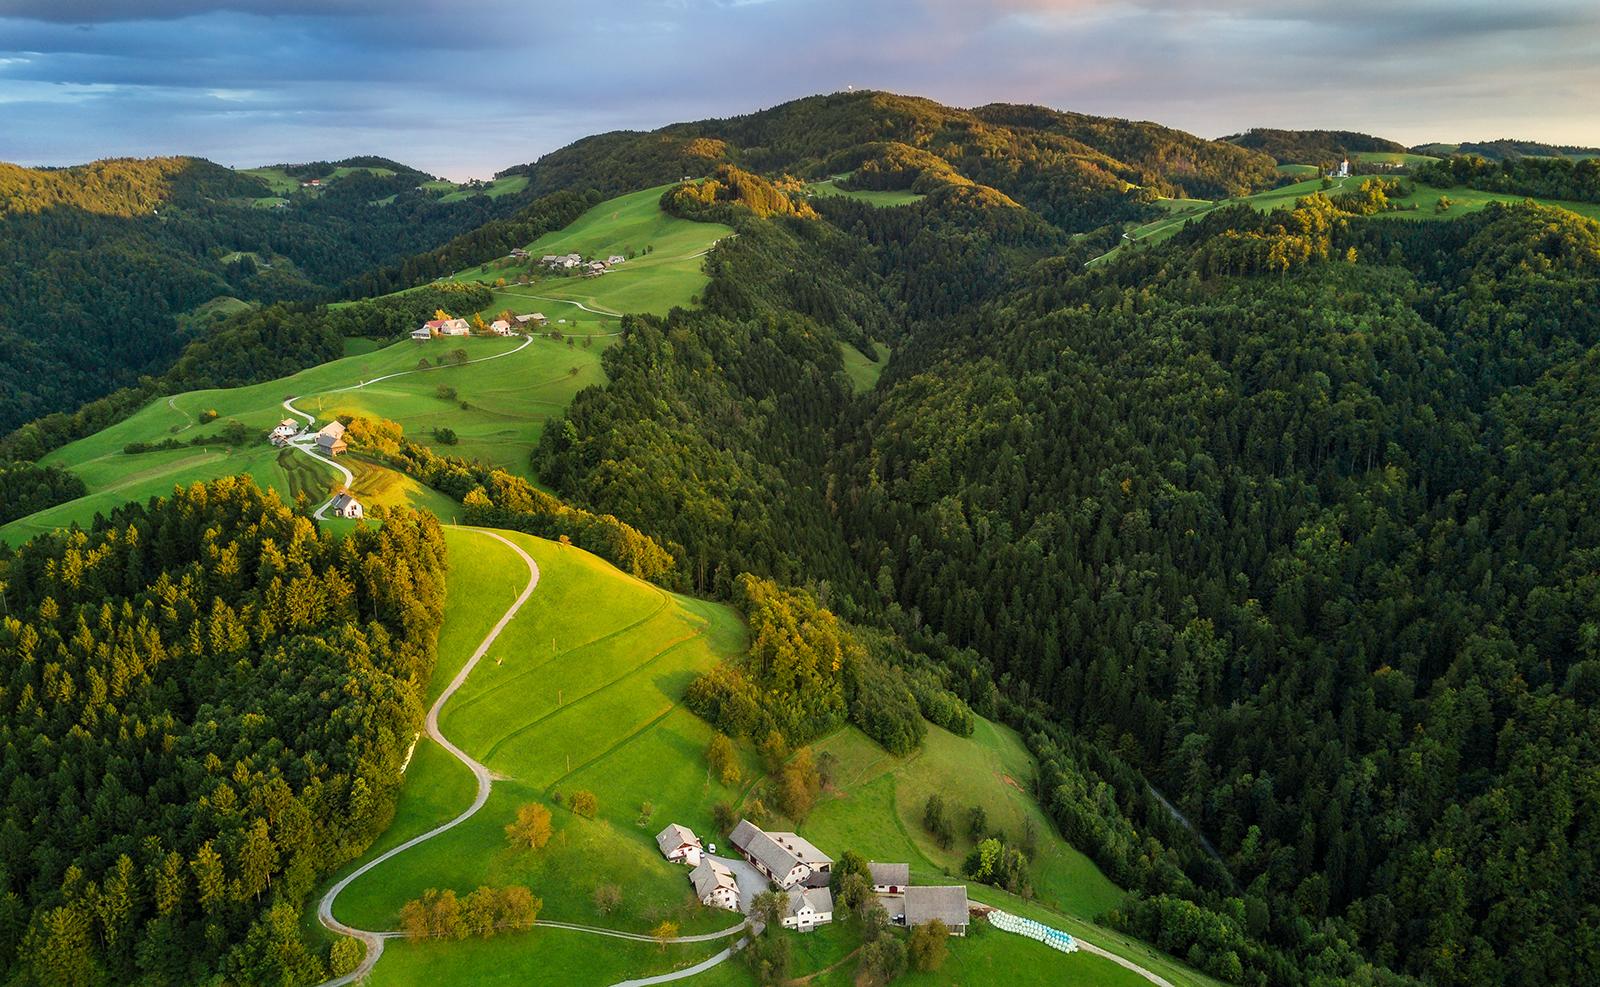 spiritual-landscape-beautiful-green-peaceful-freedom